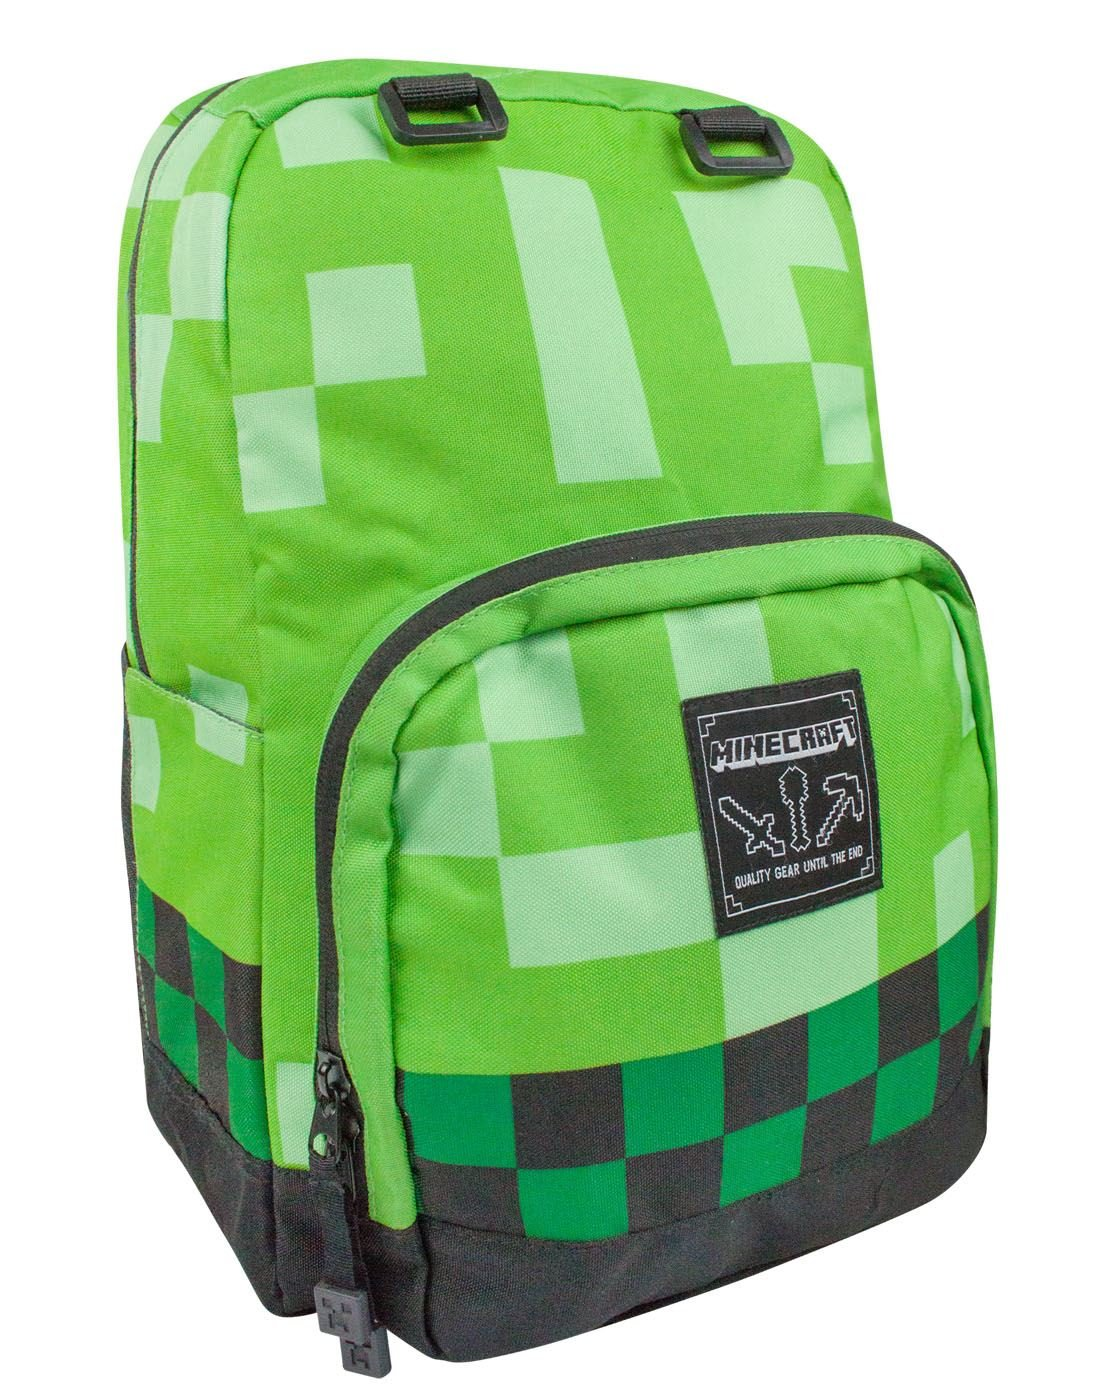 Minecraft Green Creeper Backpack